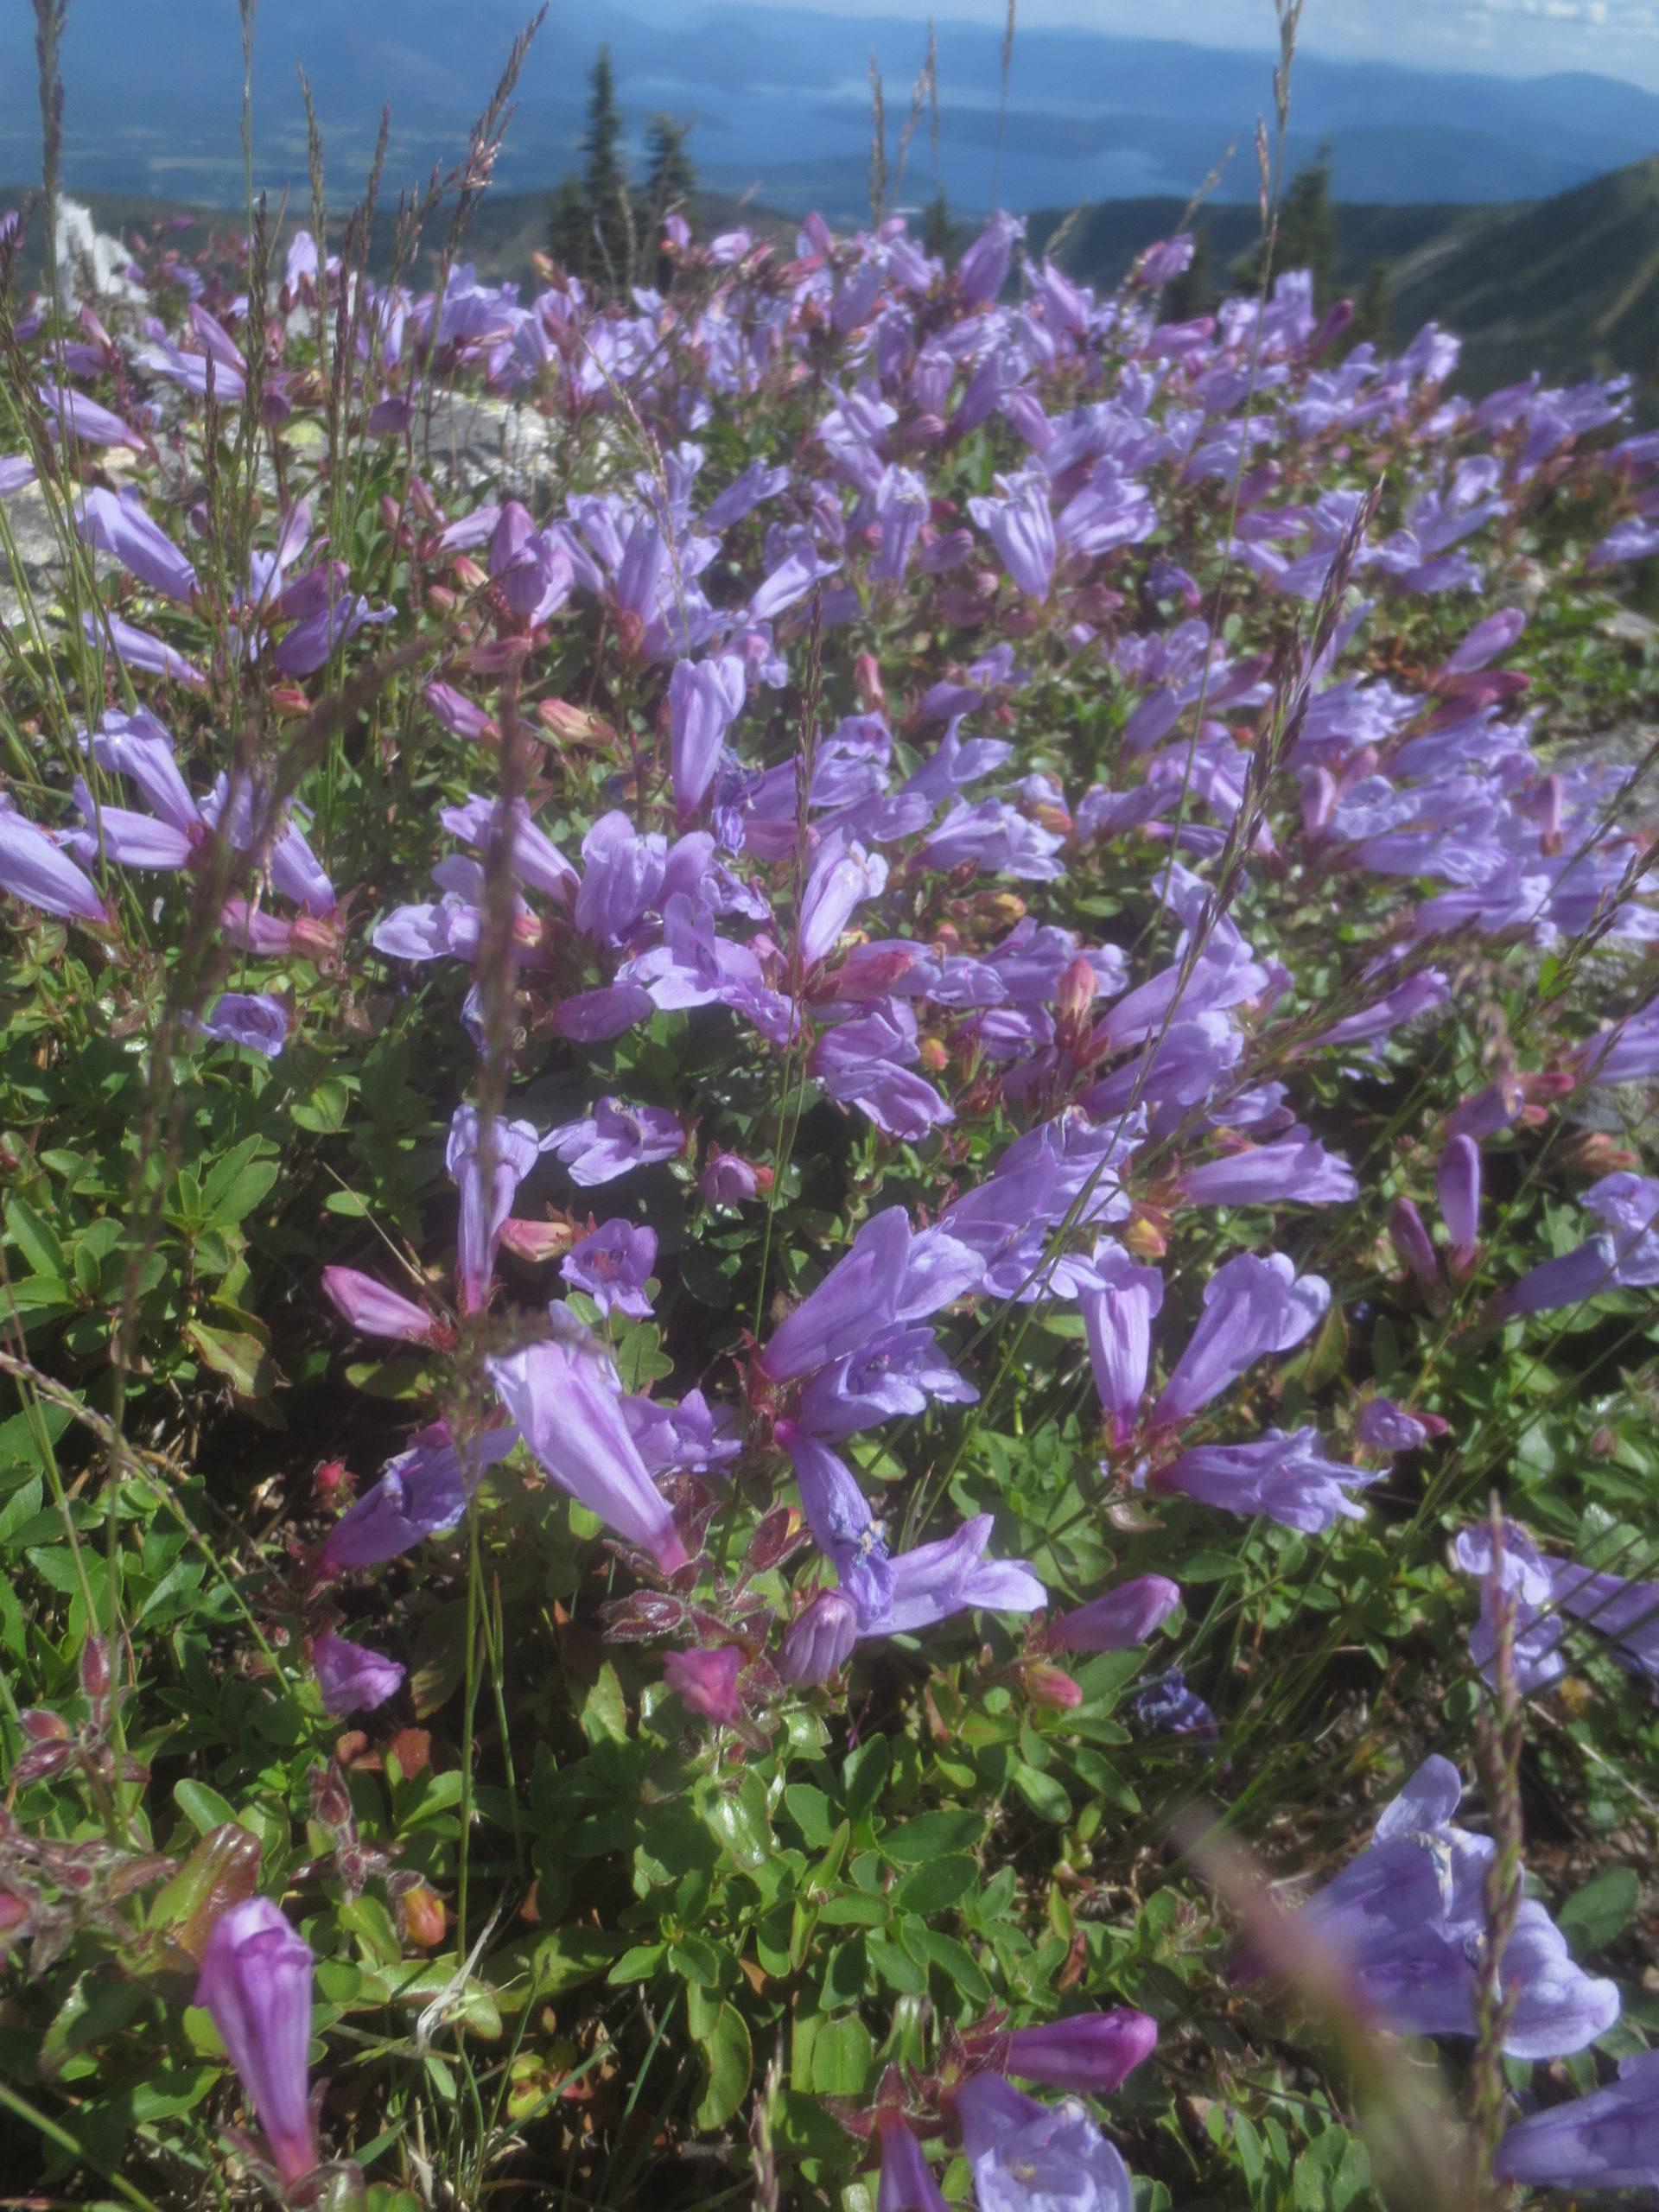 purple wildflowers on a mountain top